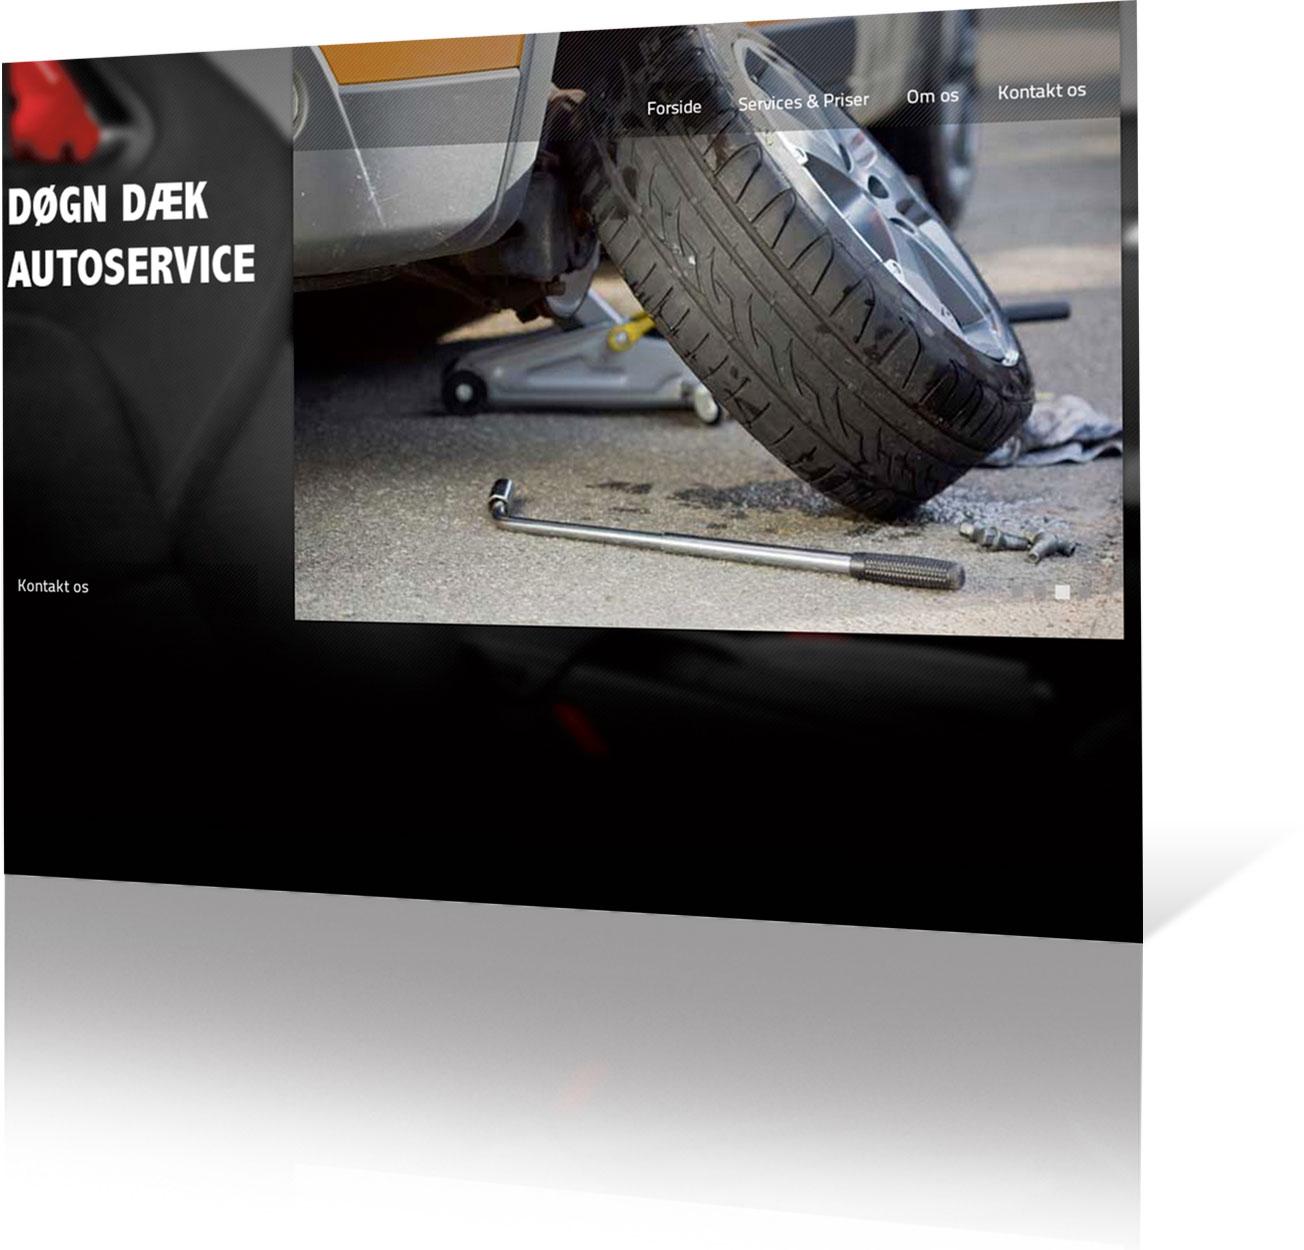 autoservice-hjemmeside